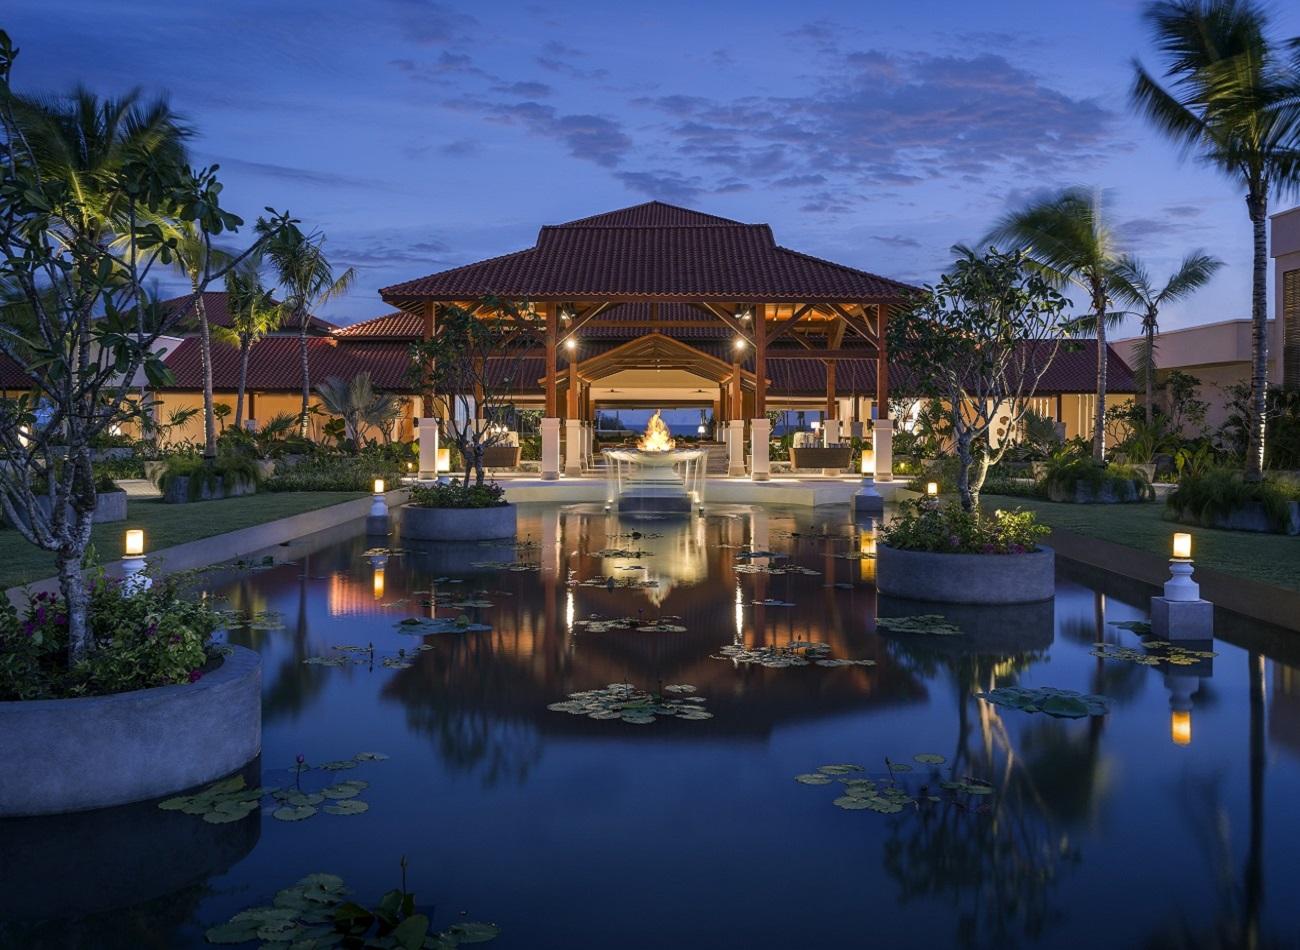 Sunset view of the exterior of Shangri-La Hambantota Resort & Spa